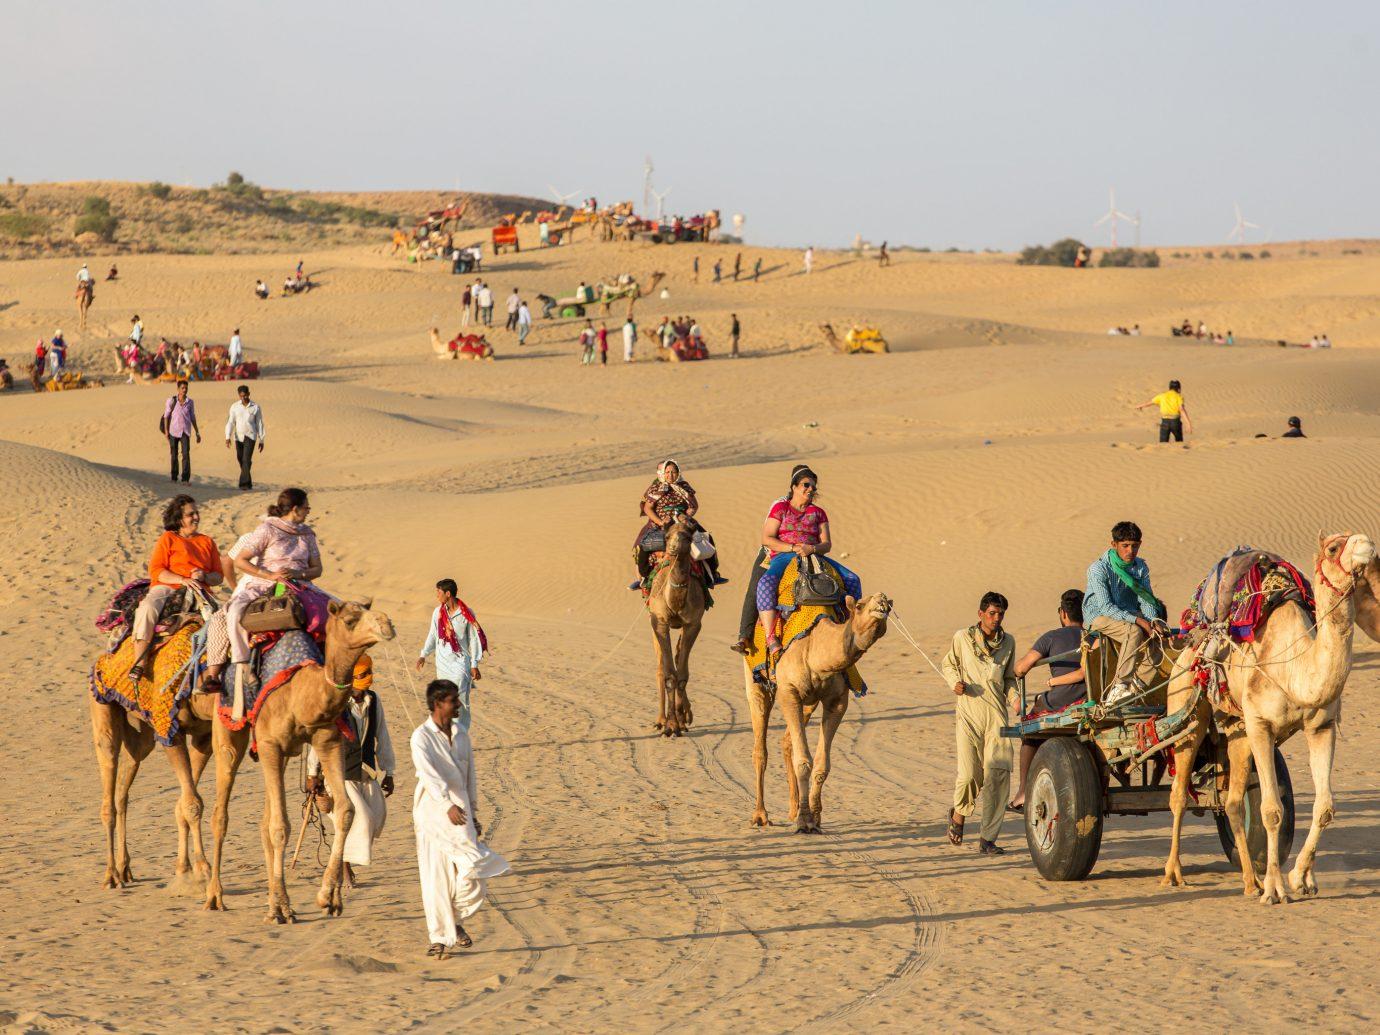 India Jaipur Jodhpur Trip Ideas Camel arabian camel camel like mammal sand sahara Desert erg pack animal tourism landscape ecoregion aeolian landform vacation